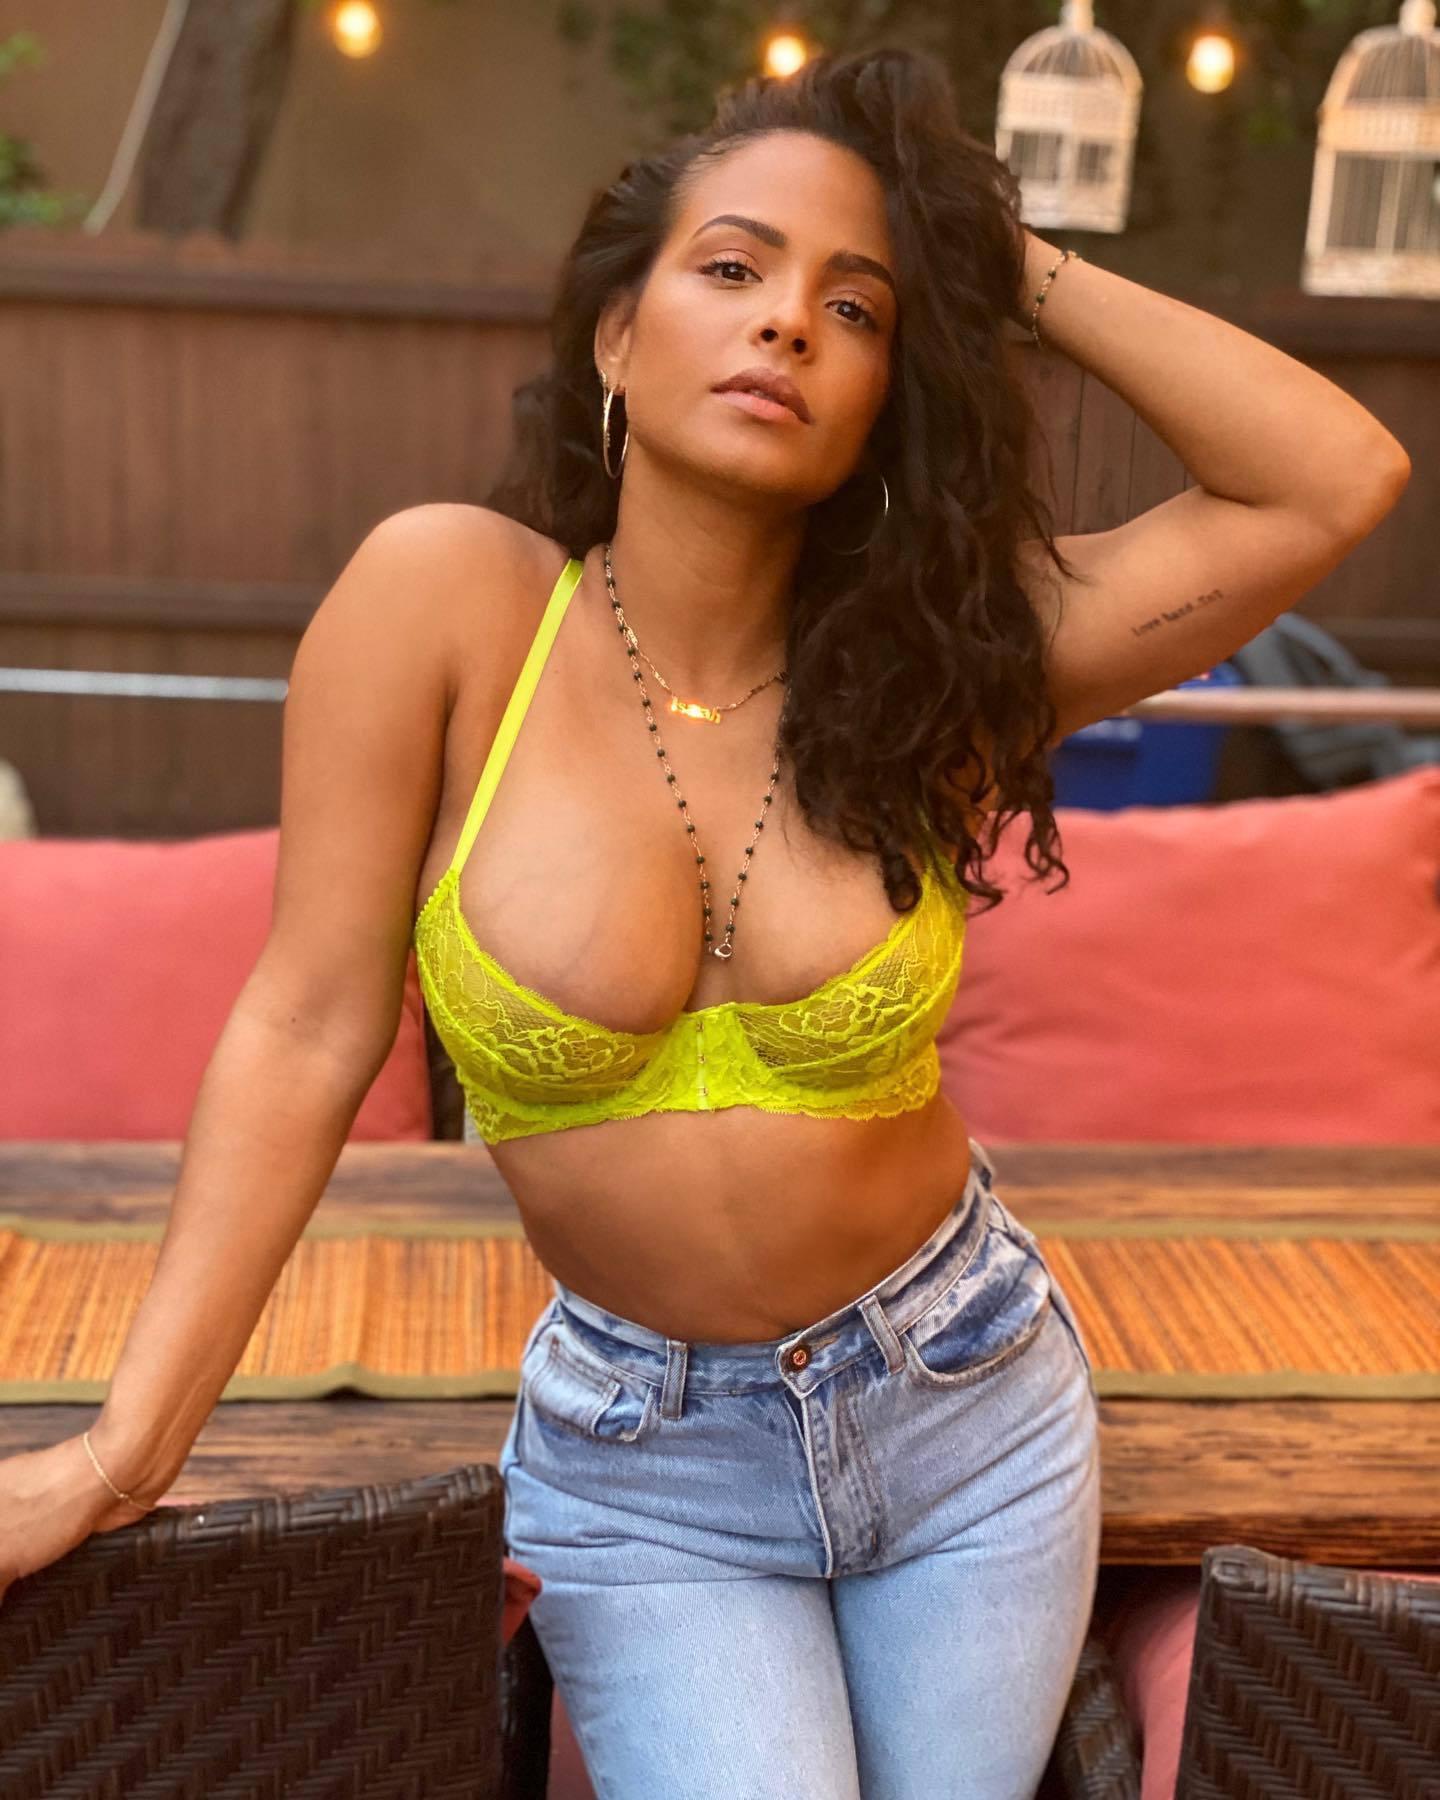 Christina Milian – Beautiful Big Boobs In Sexy Savage X Fenty Bra Photoshoot 0005